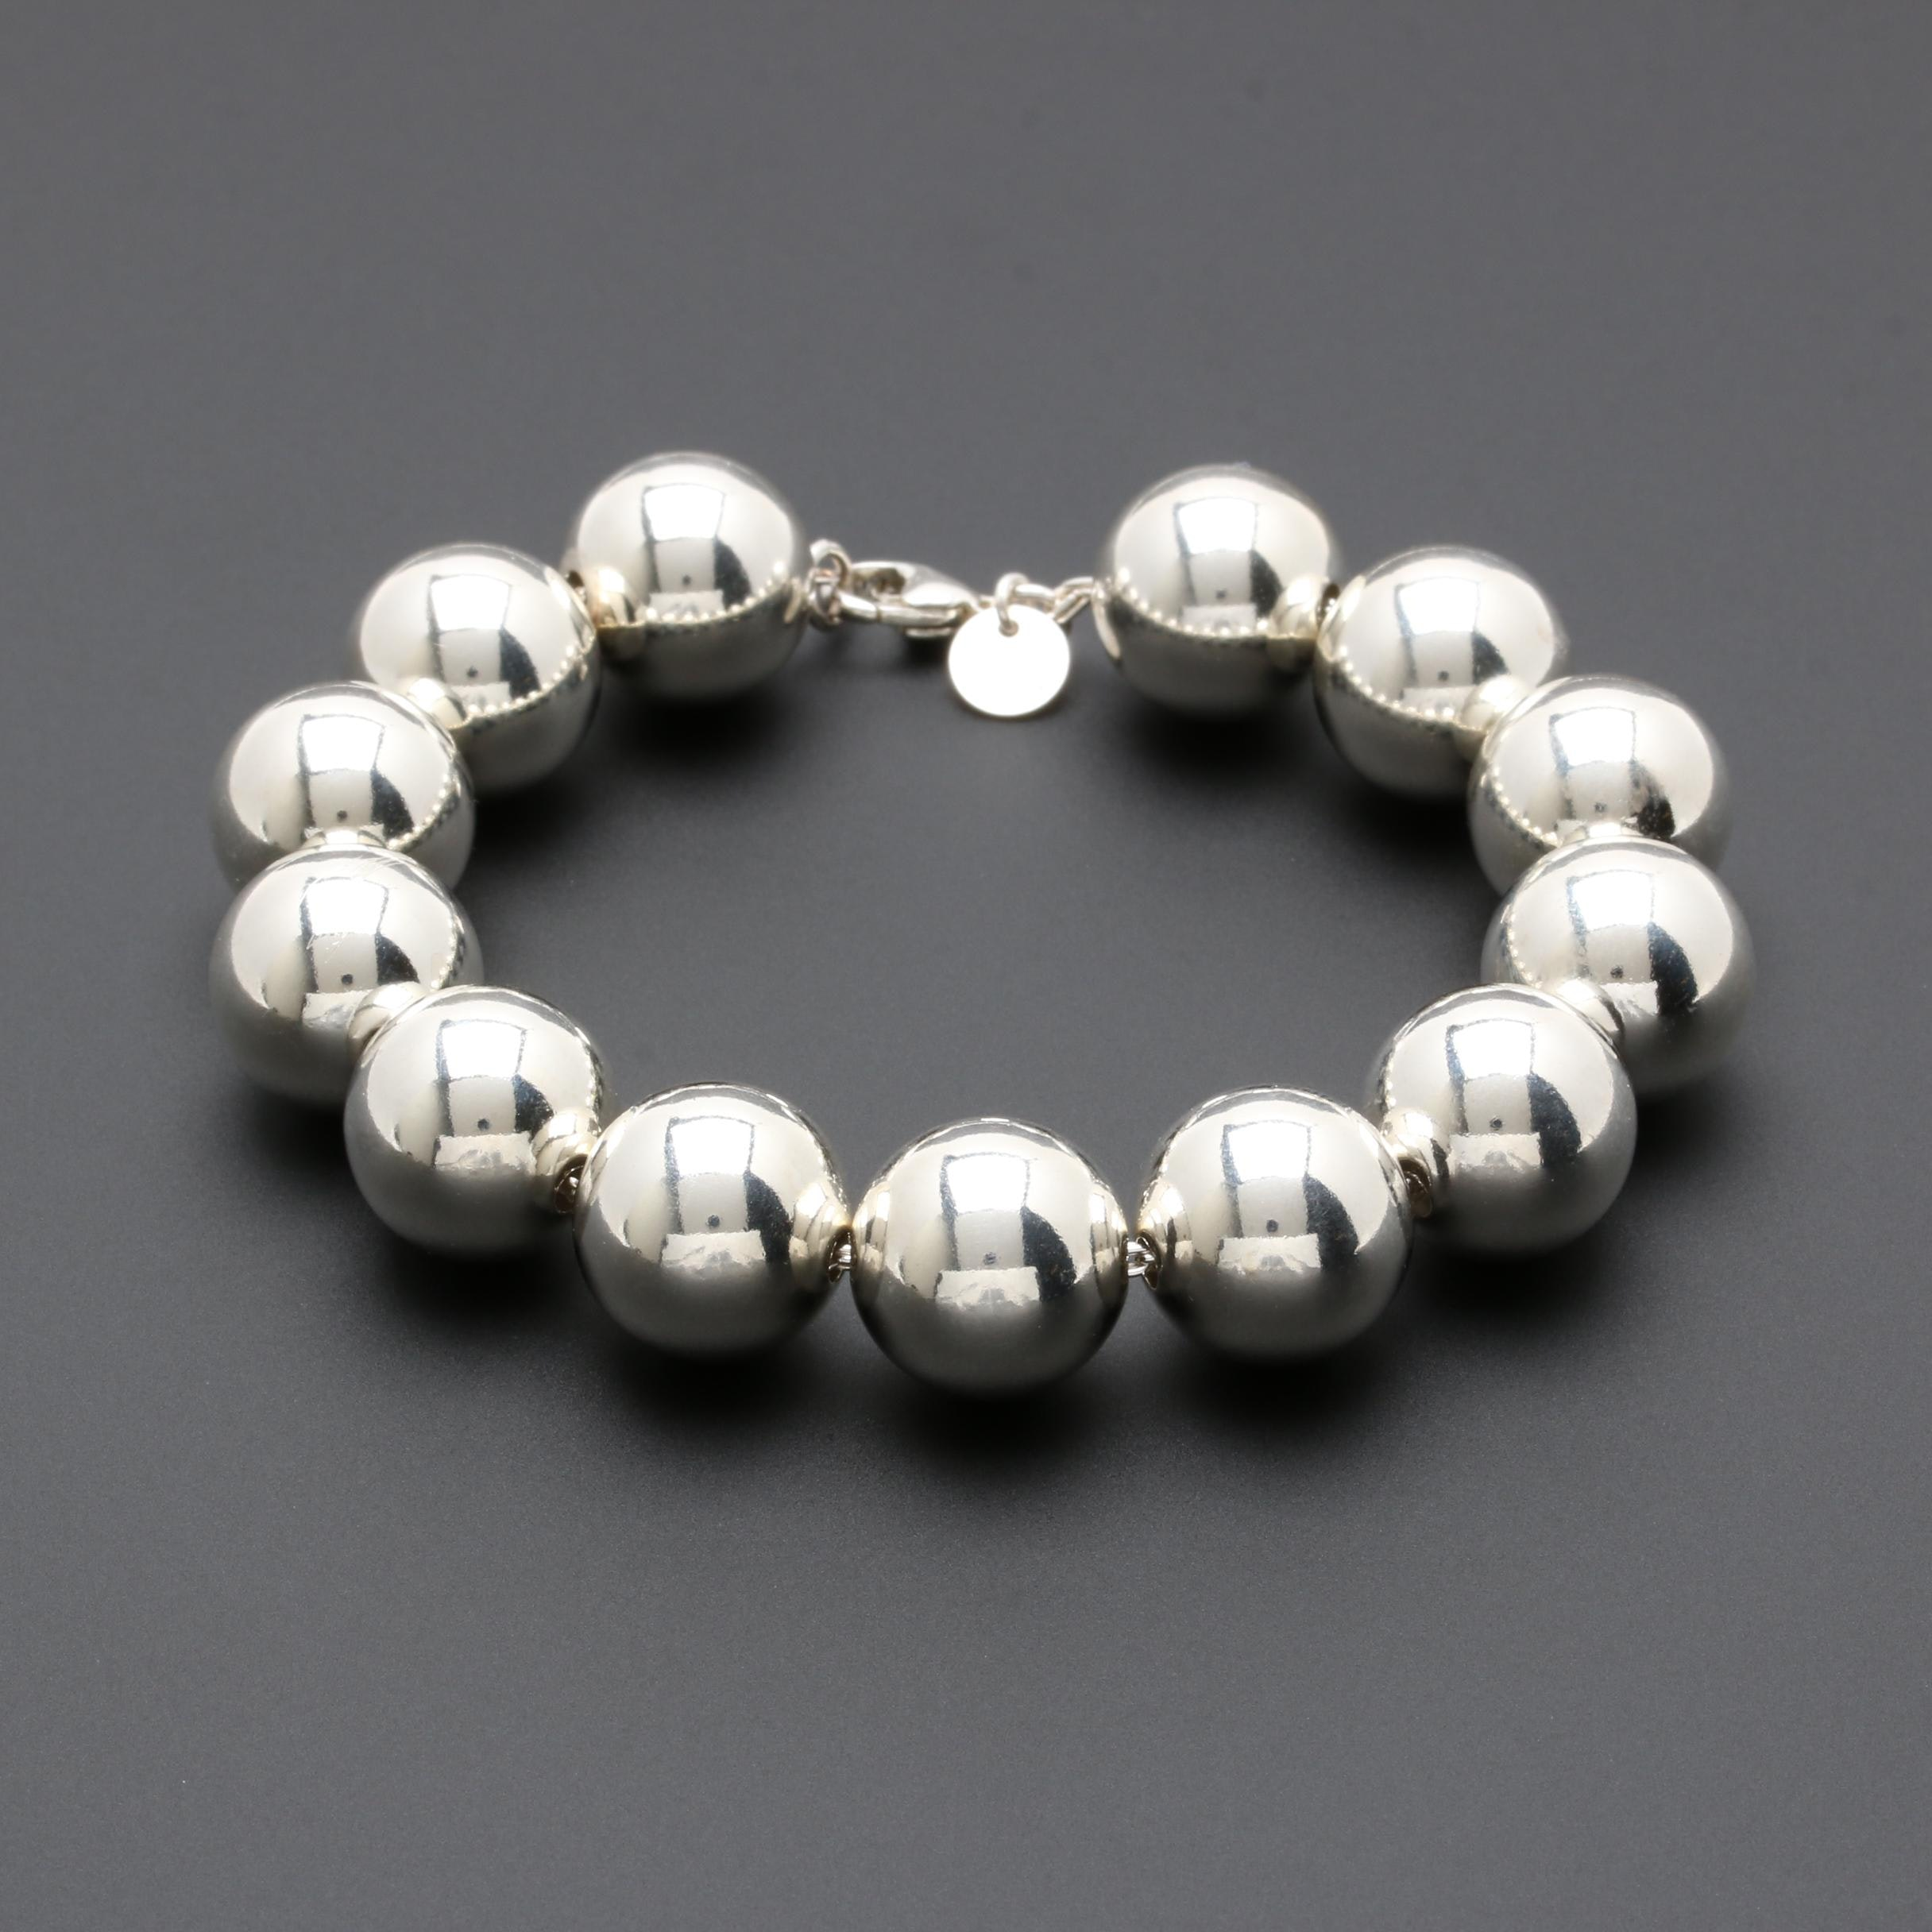 Tiffany & Co. Sterling Silver Round Beaded Bracelet